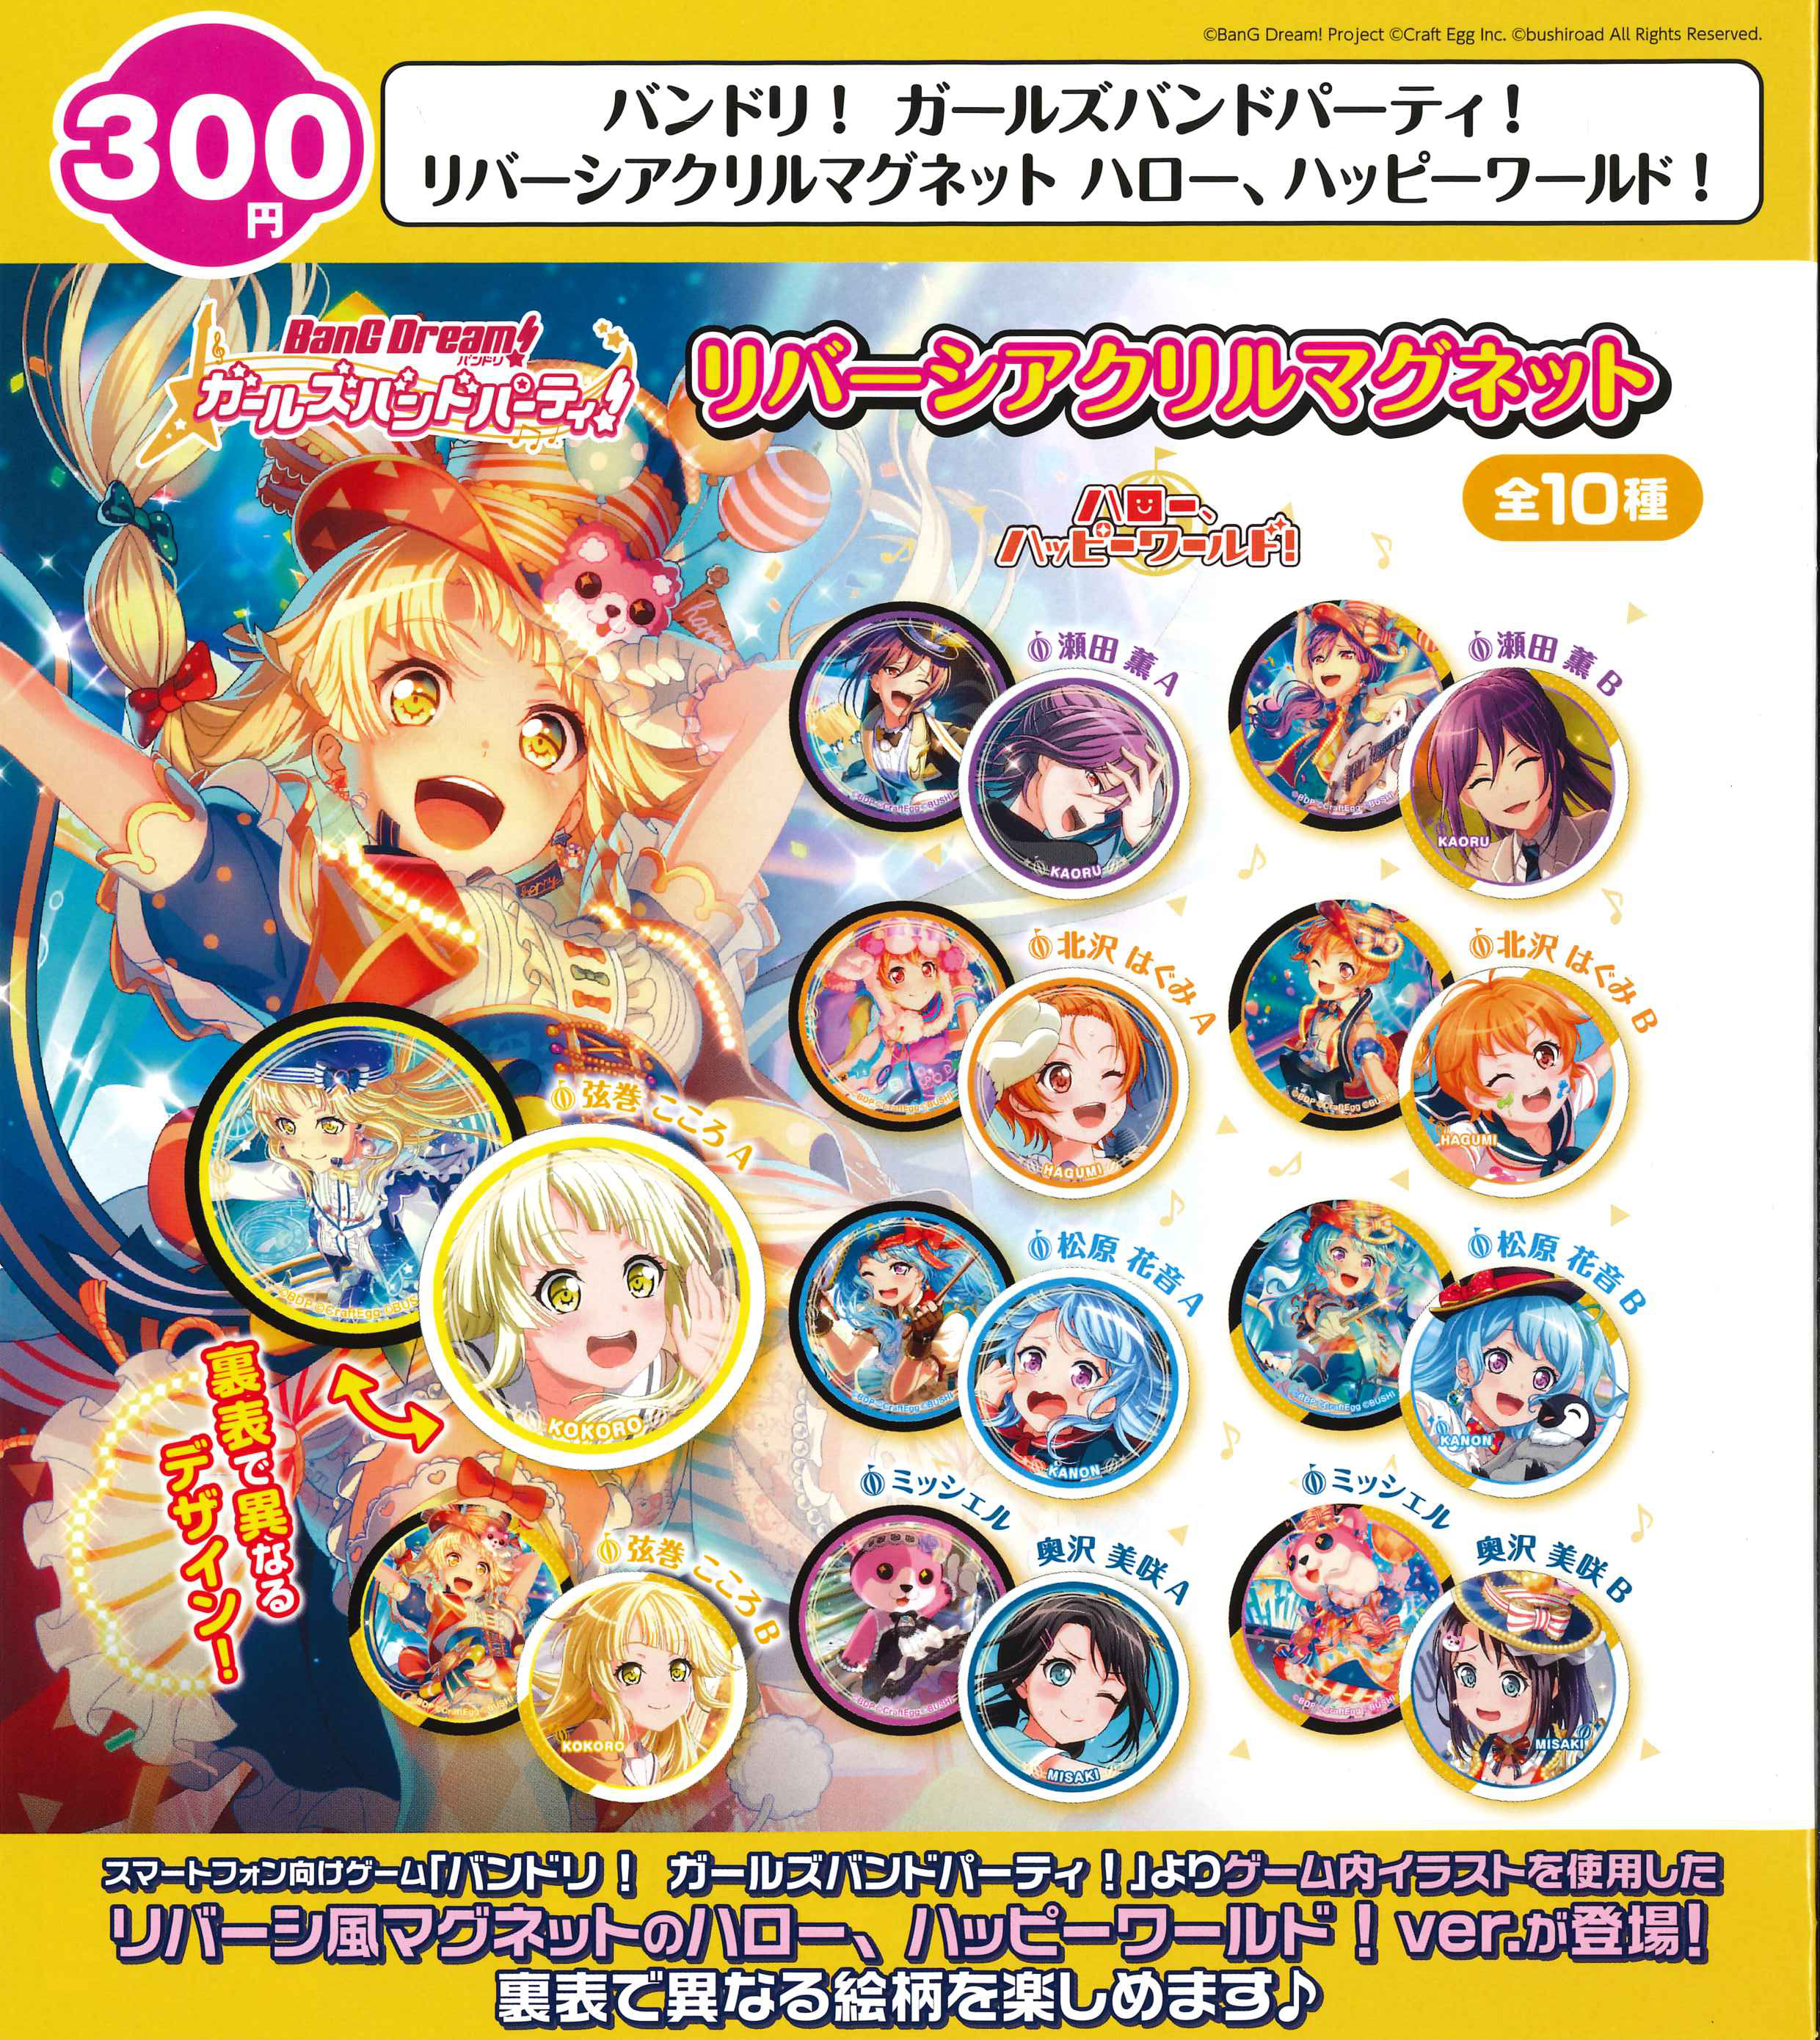 BanG Dream! 「Hello, Happy World!弦卷心 + 松原花音 + 瀨田薰 + 北澤育美 + 米歇爾」亞克力磁鐵 扭蛋 (40 個入) Reversi Acrylic Magnet Hello, Happy World! (40 Pieces)【BanG Dream!】